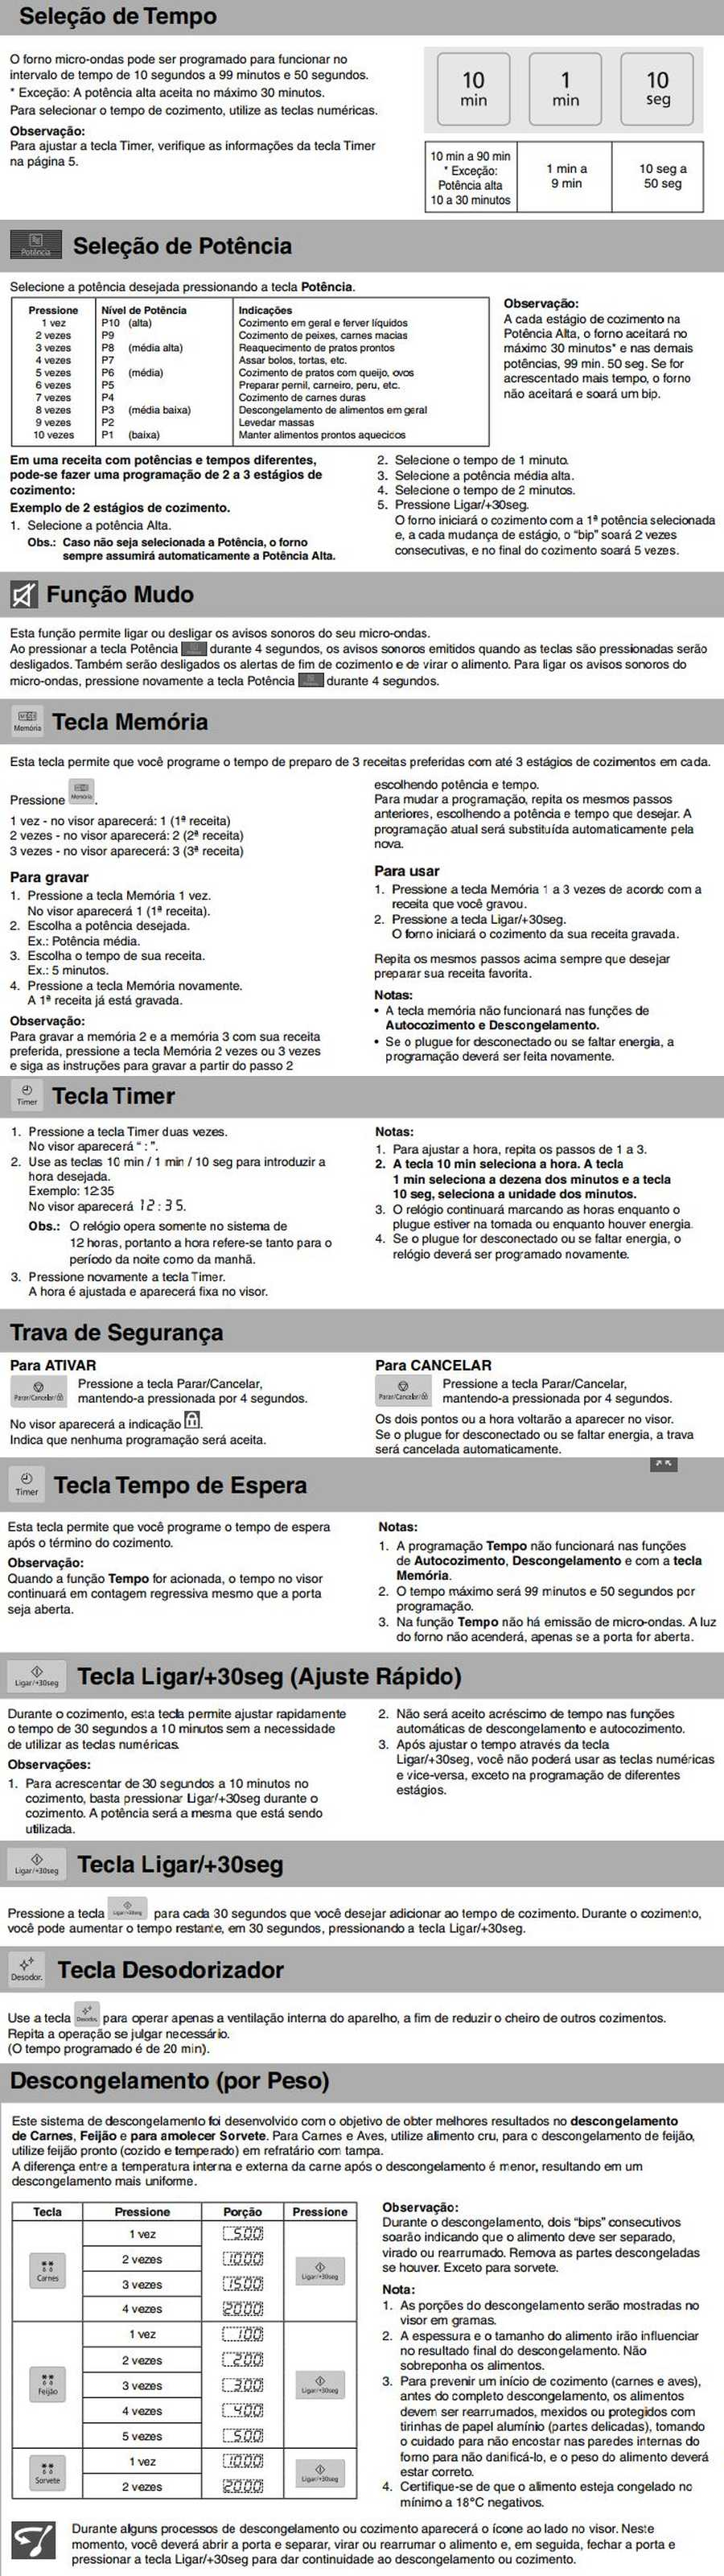 Manual de instruções do microondas Panasonic NN-ST67H - Funções